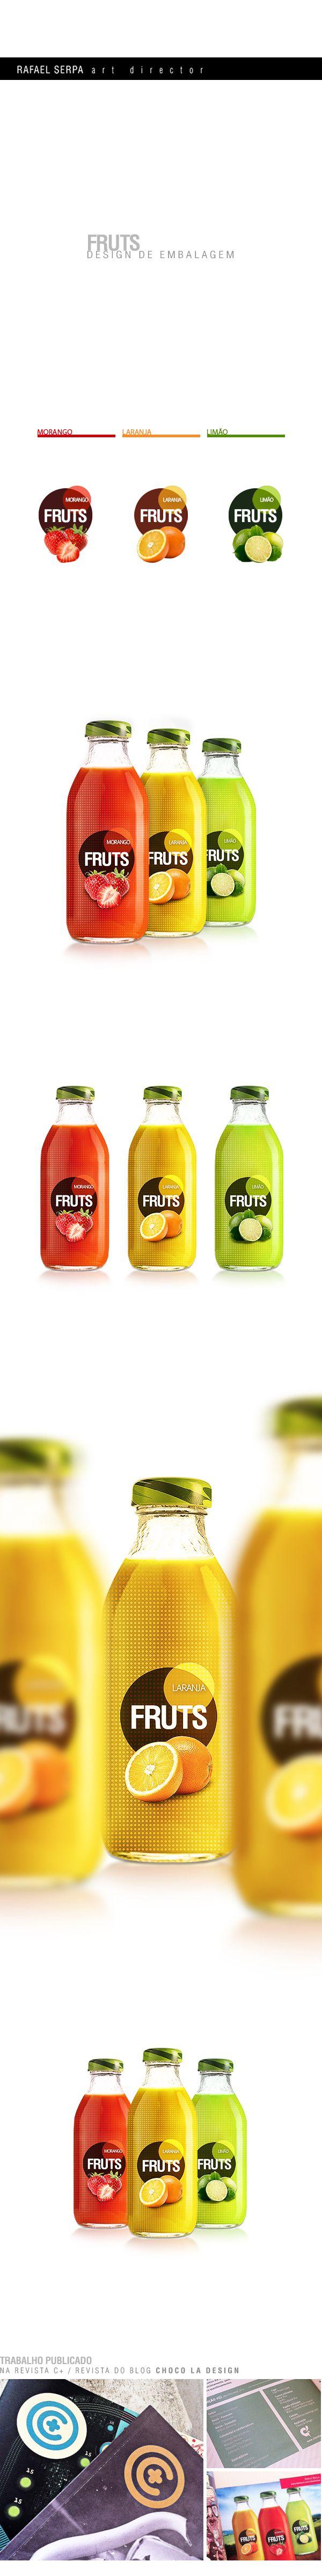 Embalagem - Fruts Juice by Rafael Serpa, via Behance